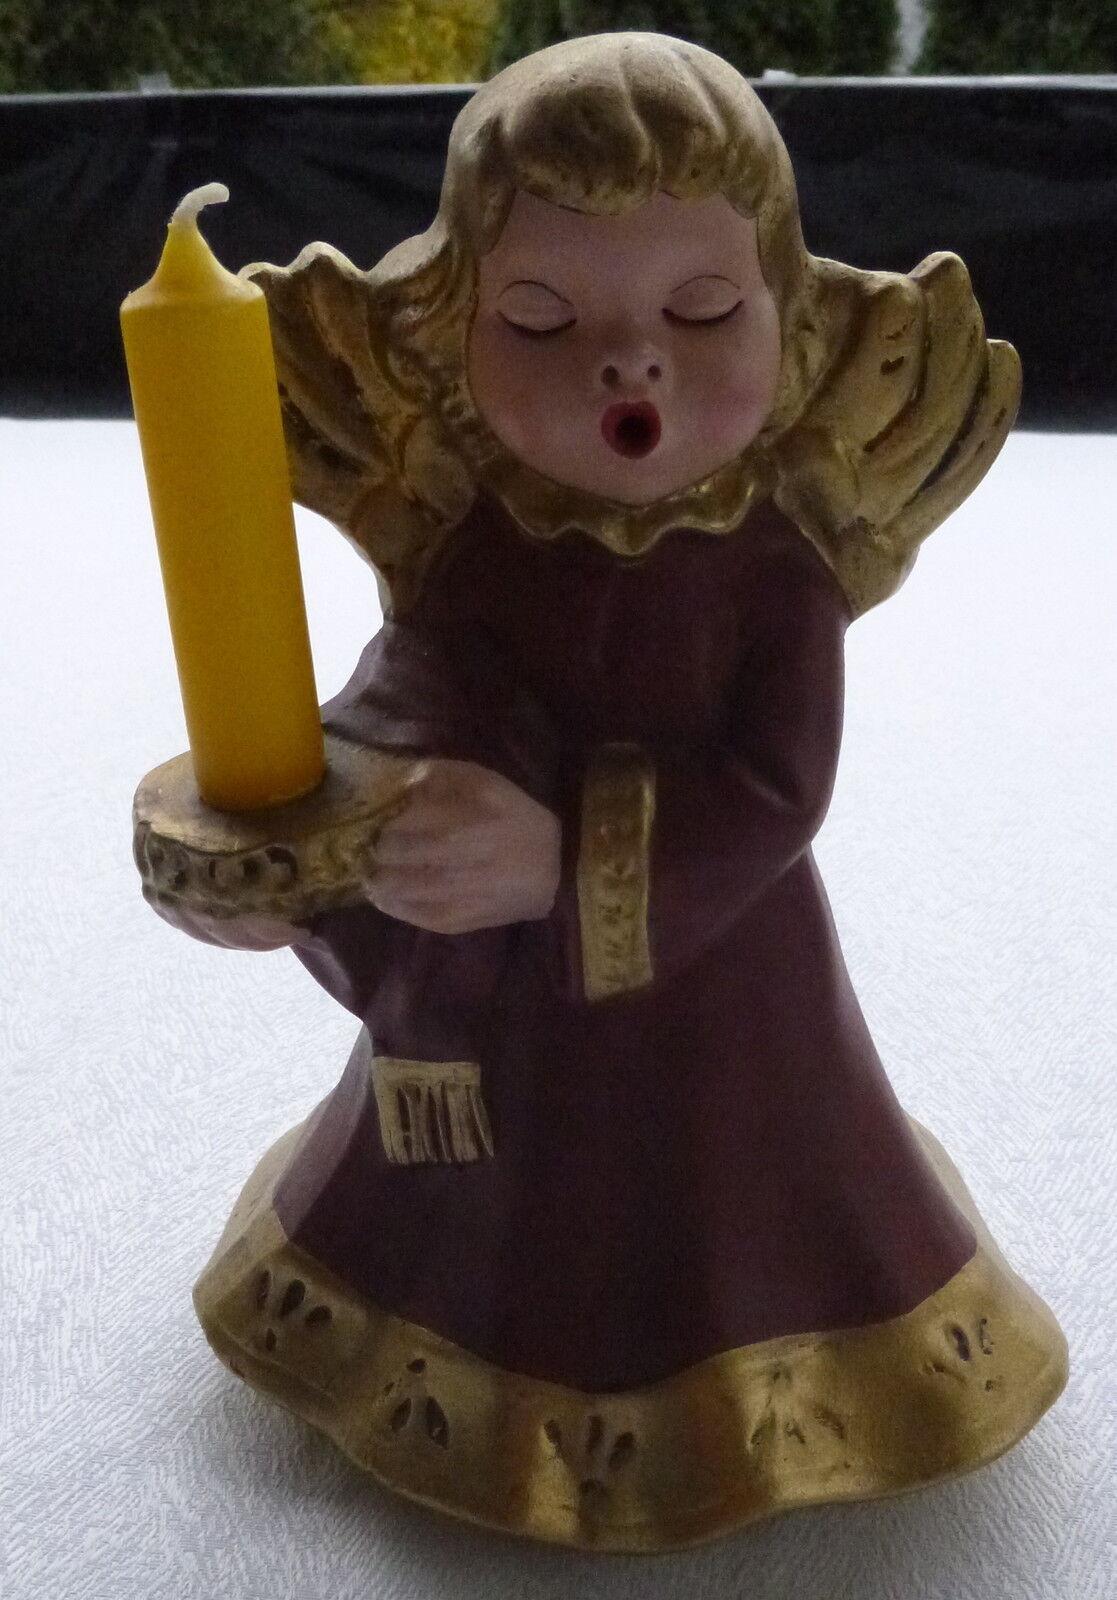 Bozener Engel Figur Figur Figur Weihnachtsdeko 21 cm mit Kerze Thun Engel 591d15